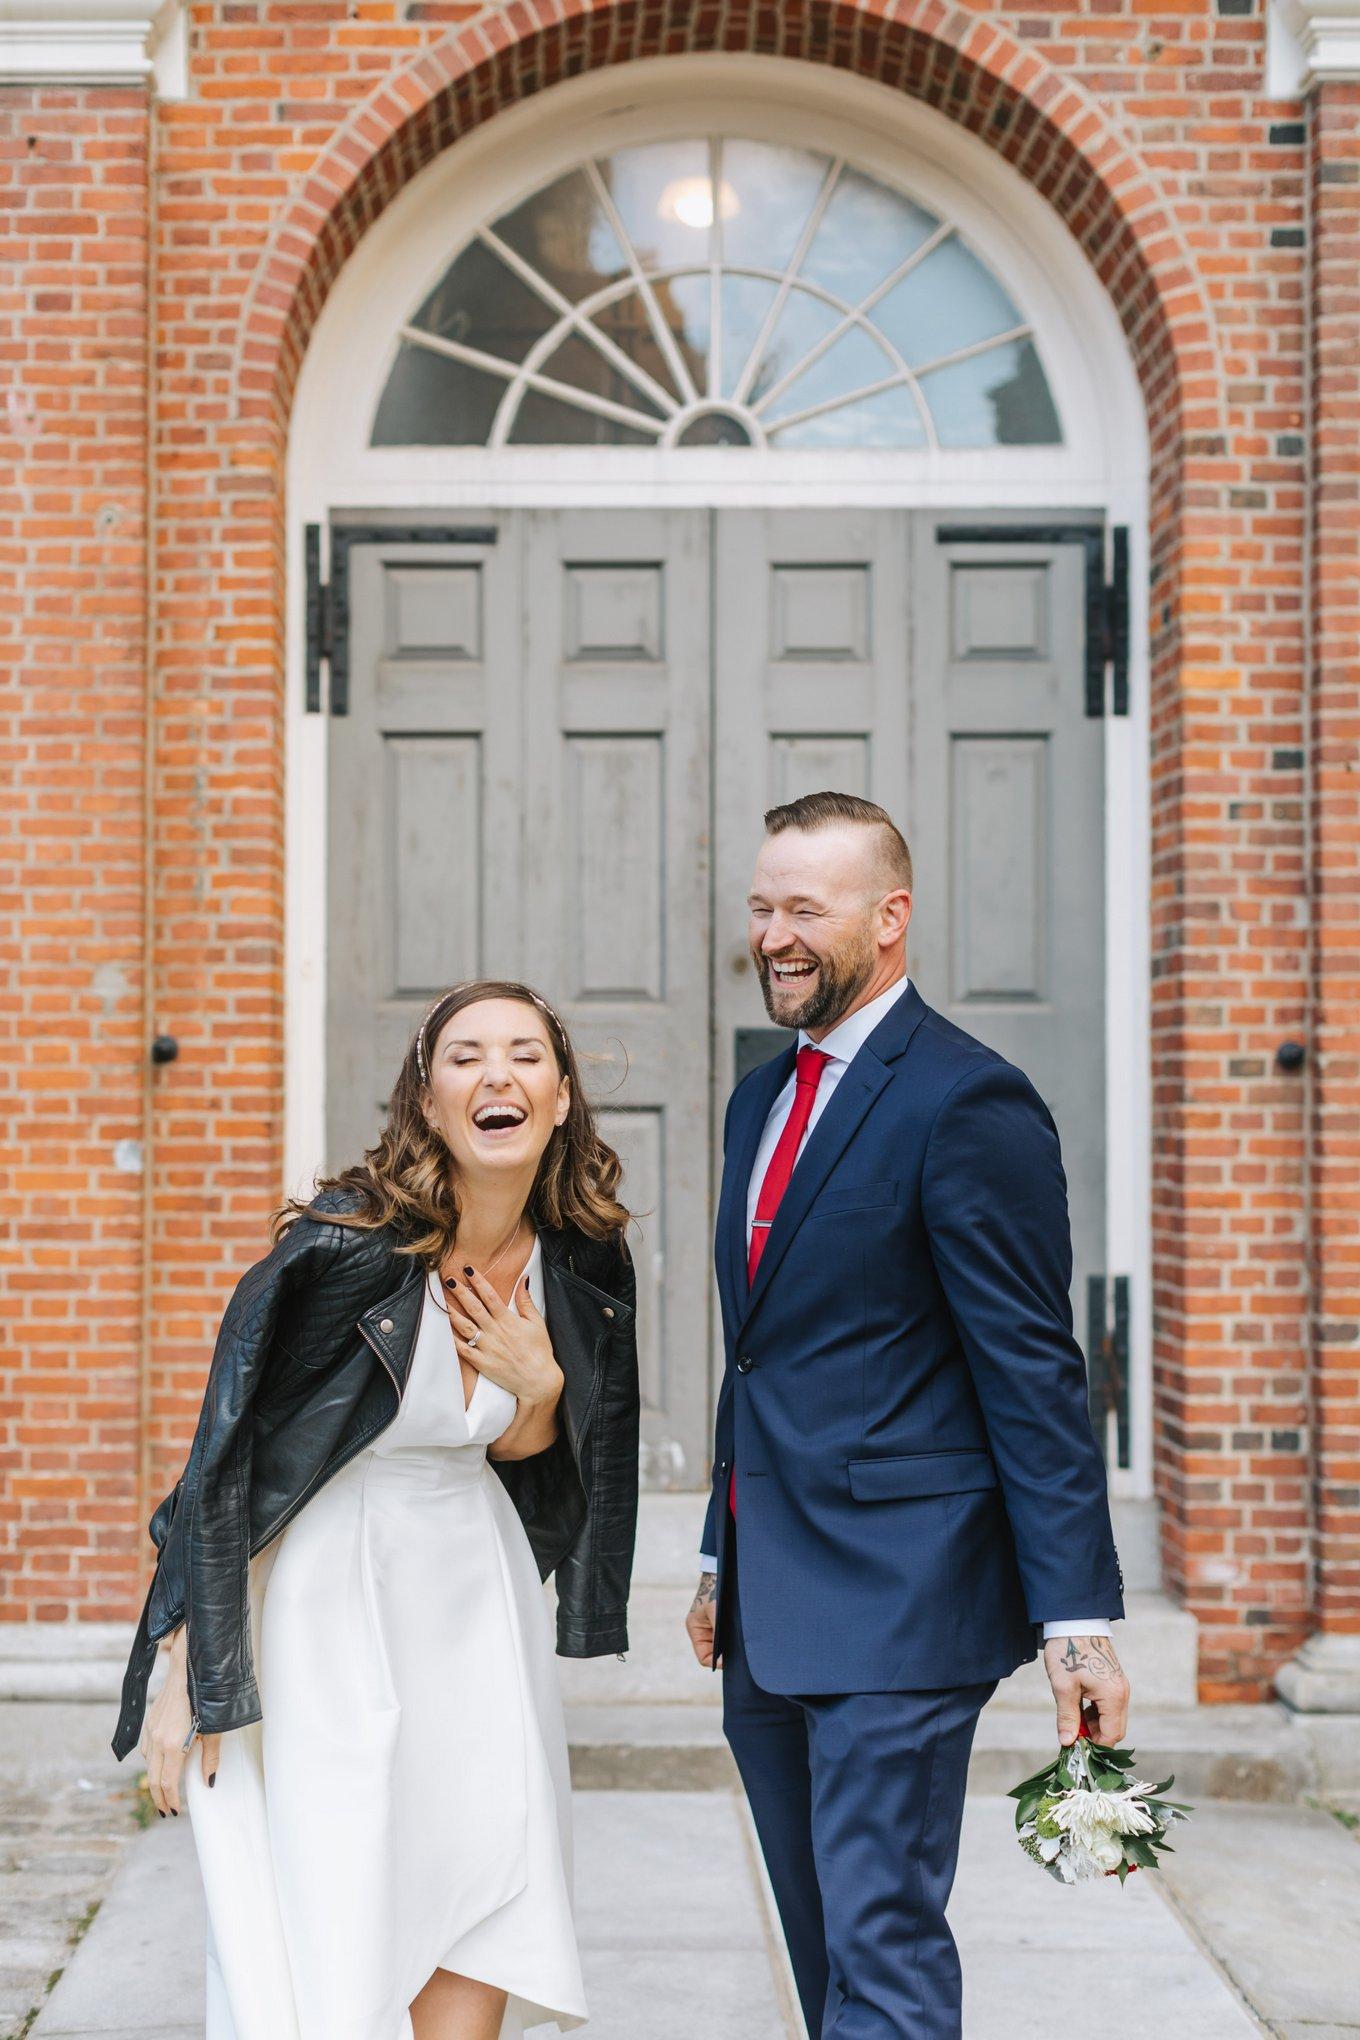 Boston-City-Hall-Wedding-Elopement-Photographer-Lena-Mirisola-8.JPG